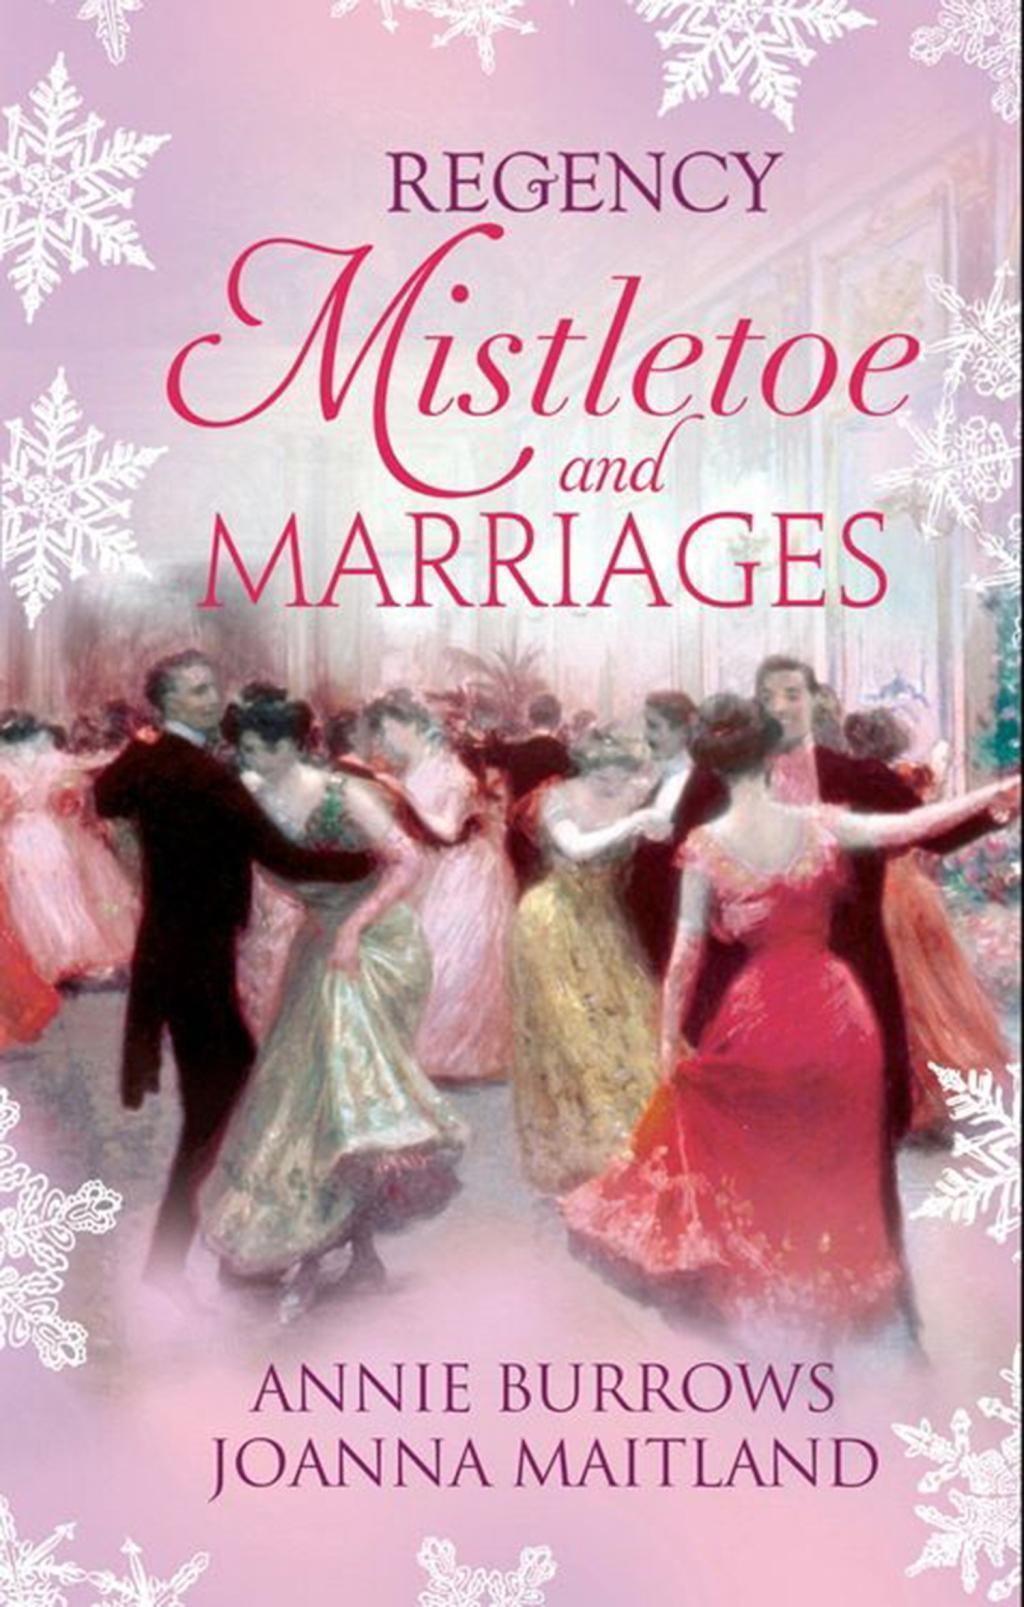 Regency Mistletoe & Marriages: A Countess by Christmas / The Earl's Mistletoe Bride (Mills & Boon M&B)